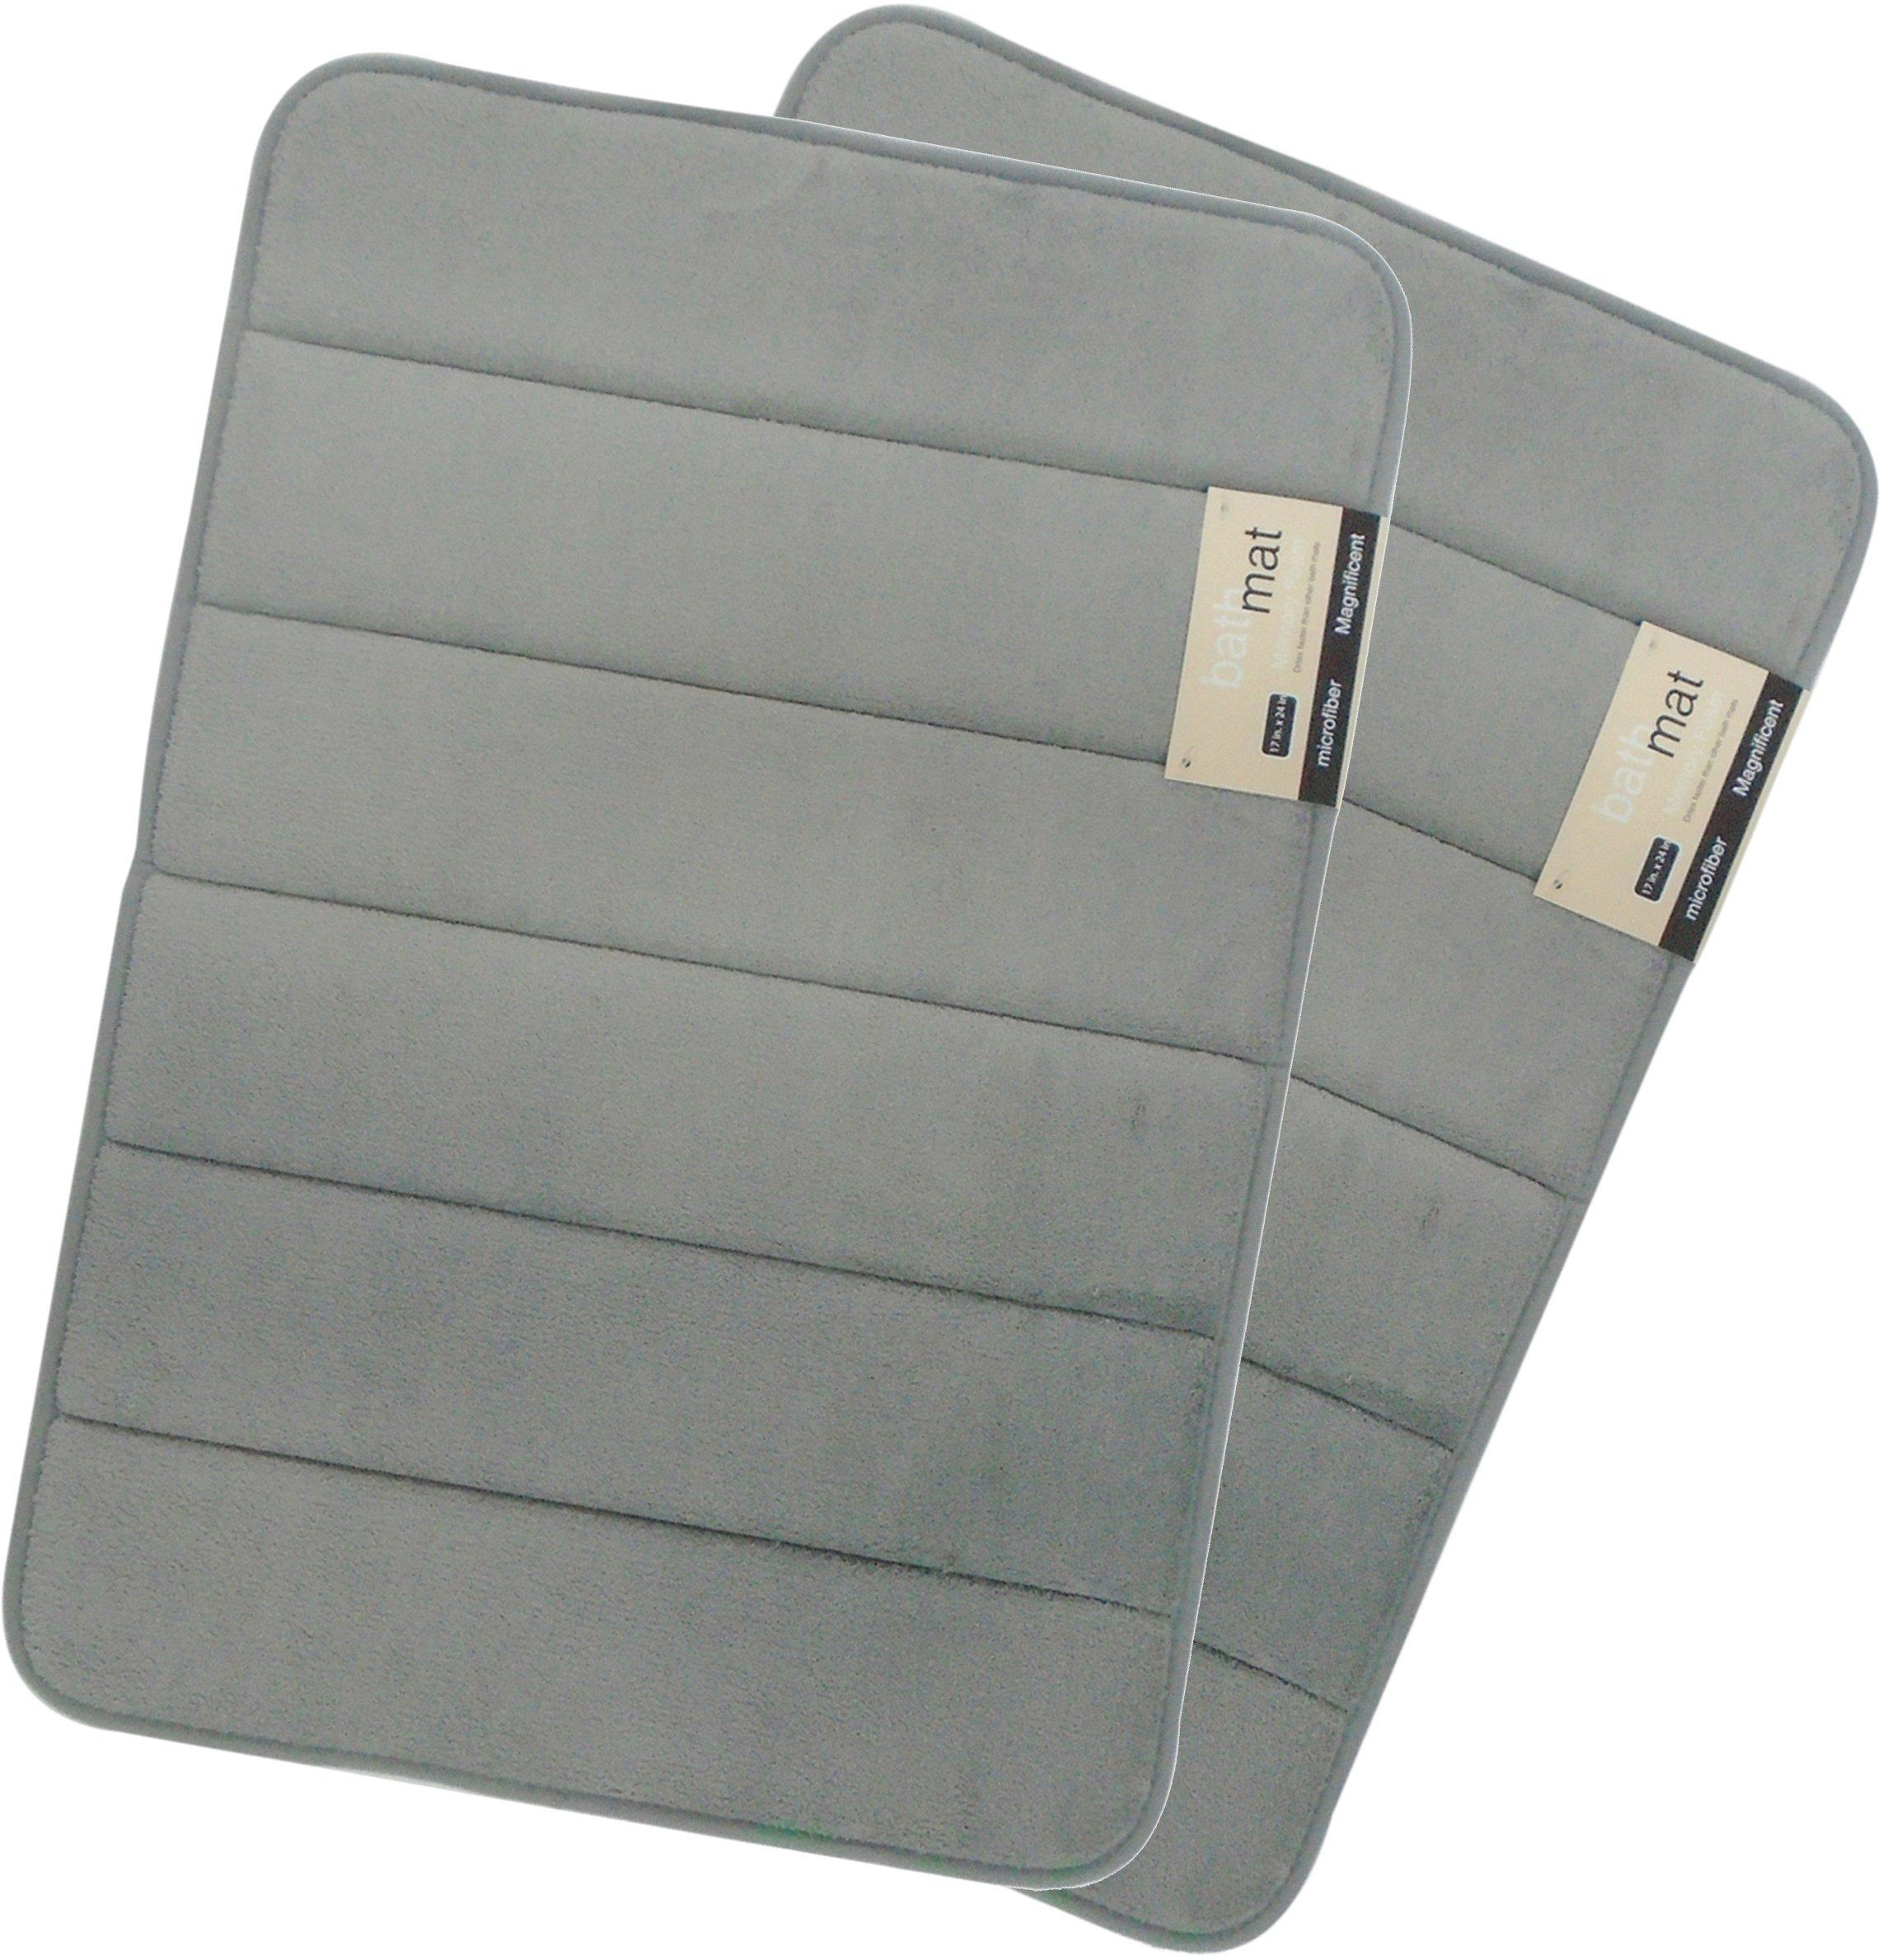 Magnificent 17 X 24 inch Memory Foam Bath Mat, Soft, Non-slip, High Absorbency - 2 Pack (Grey)